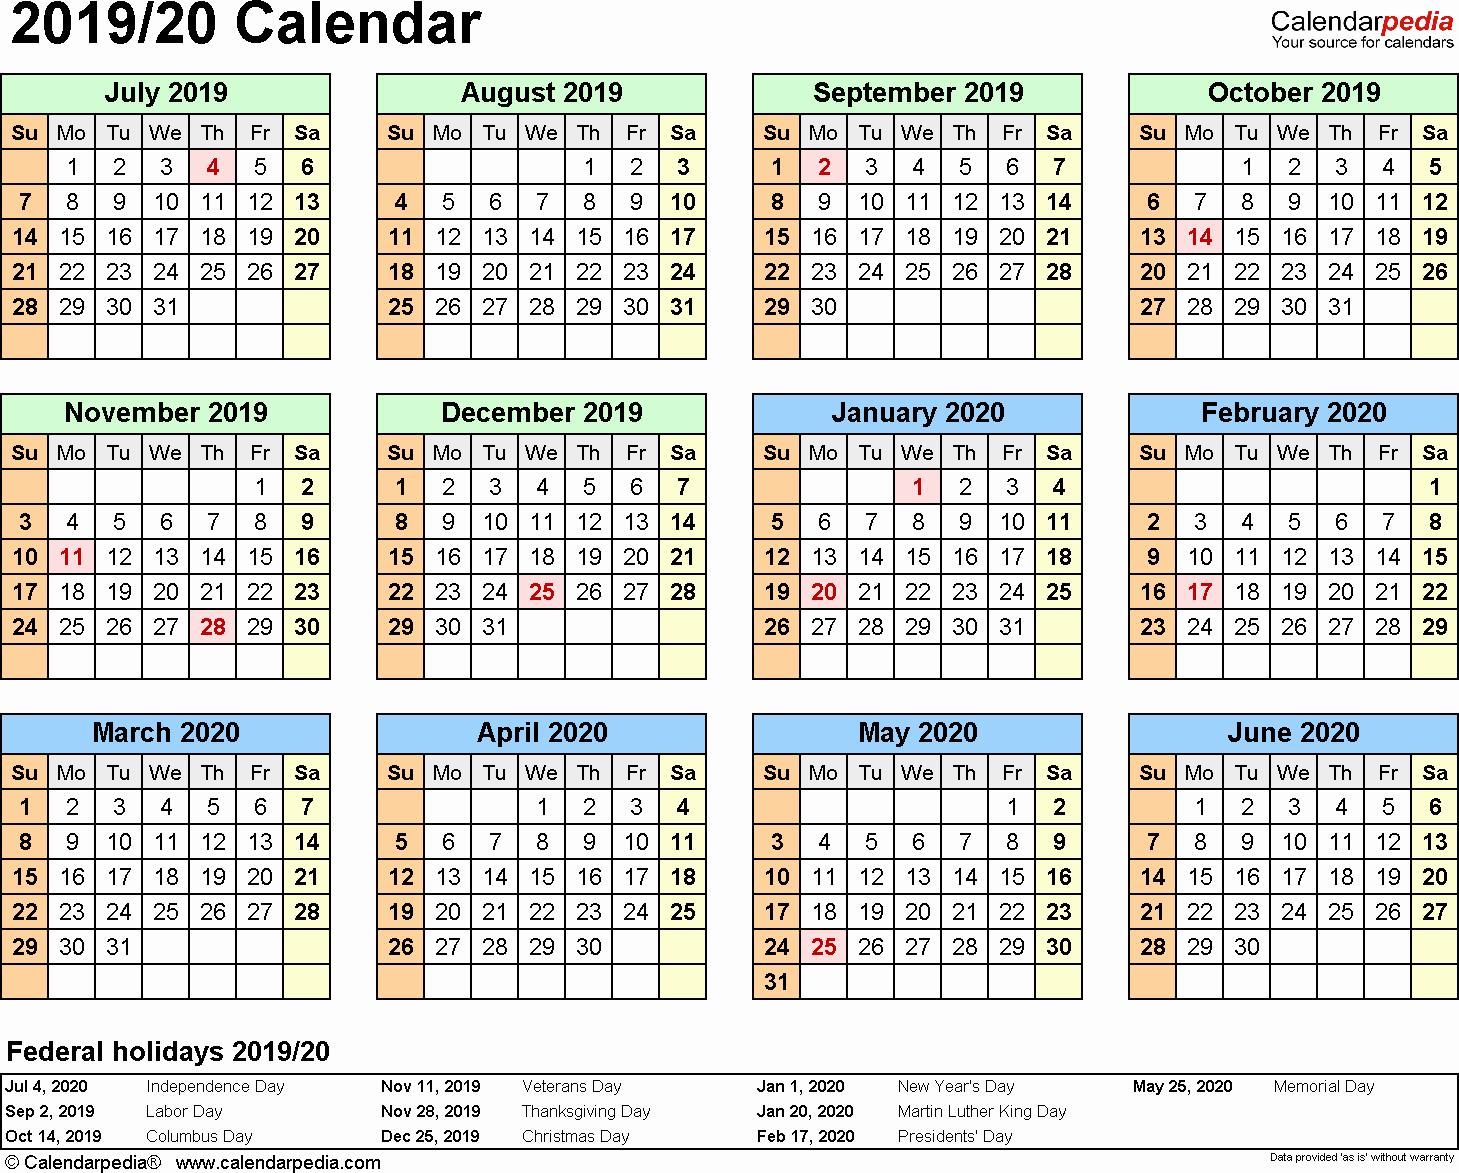 2019 and 2020 calendar printable fresh split year calendar 2019 20 july to june word templates